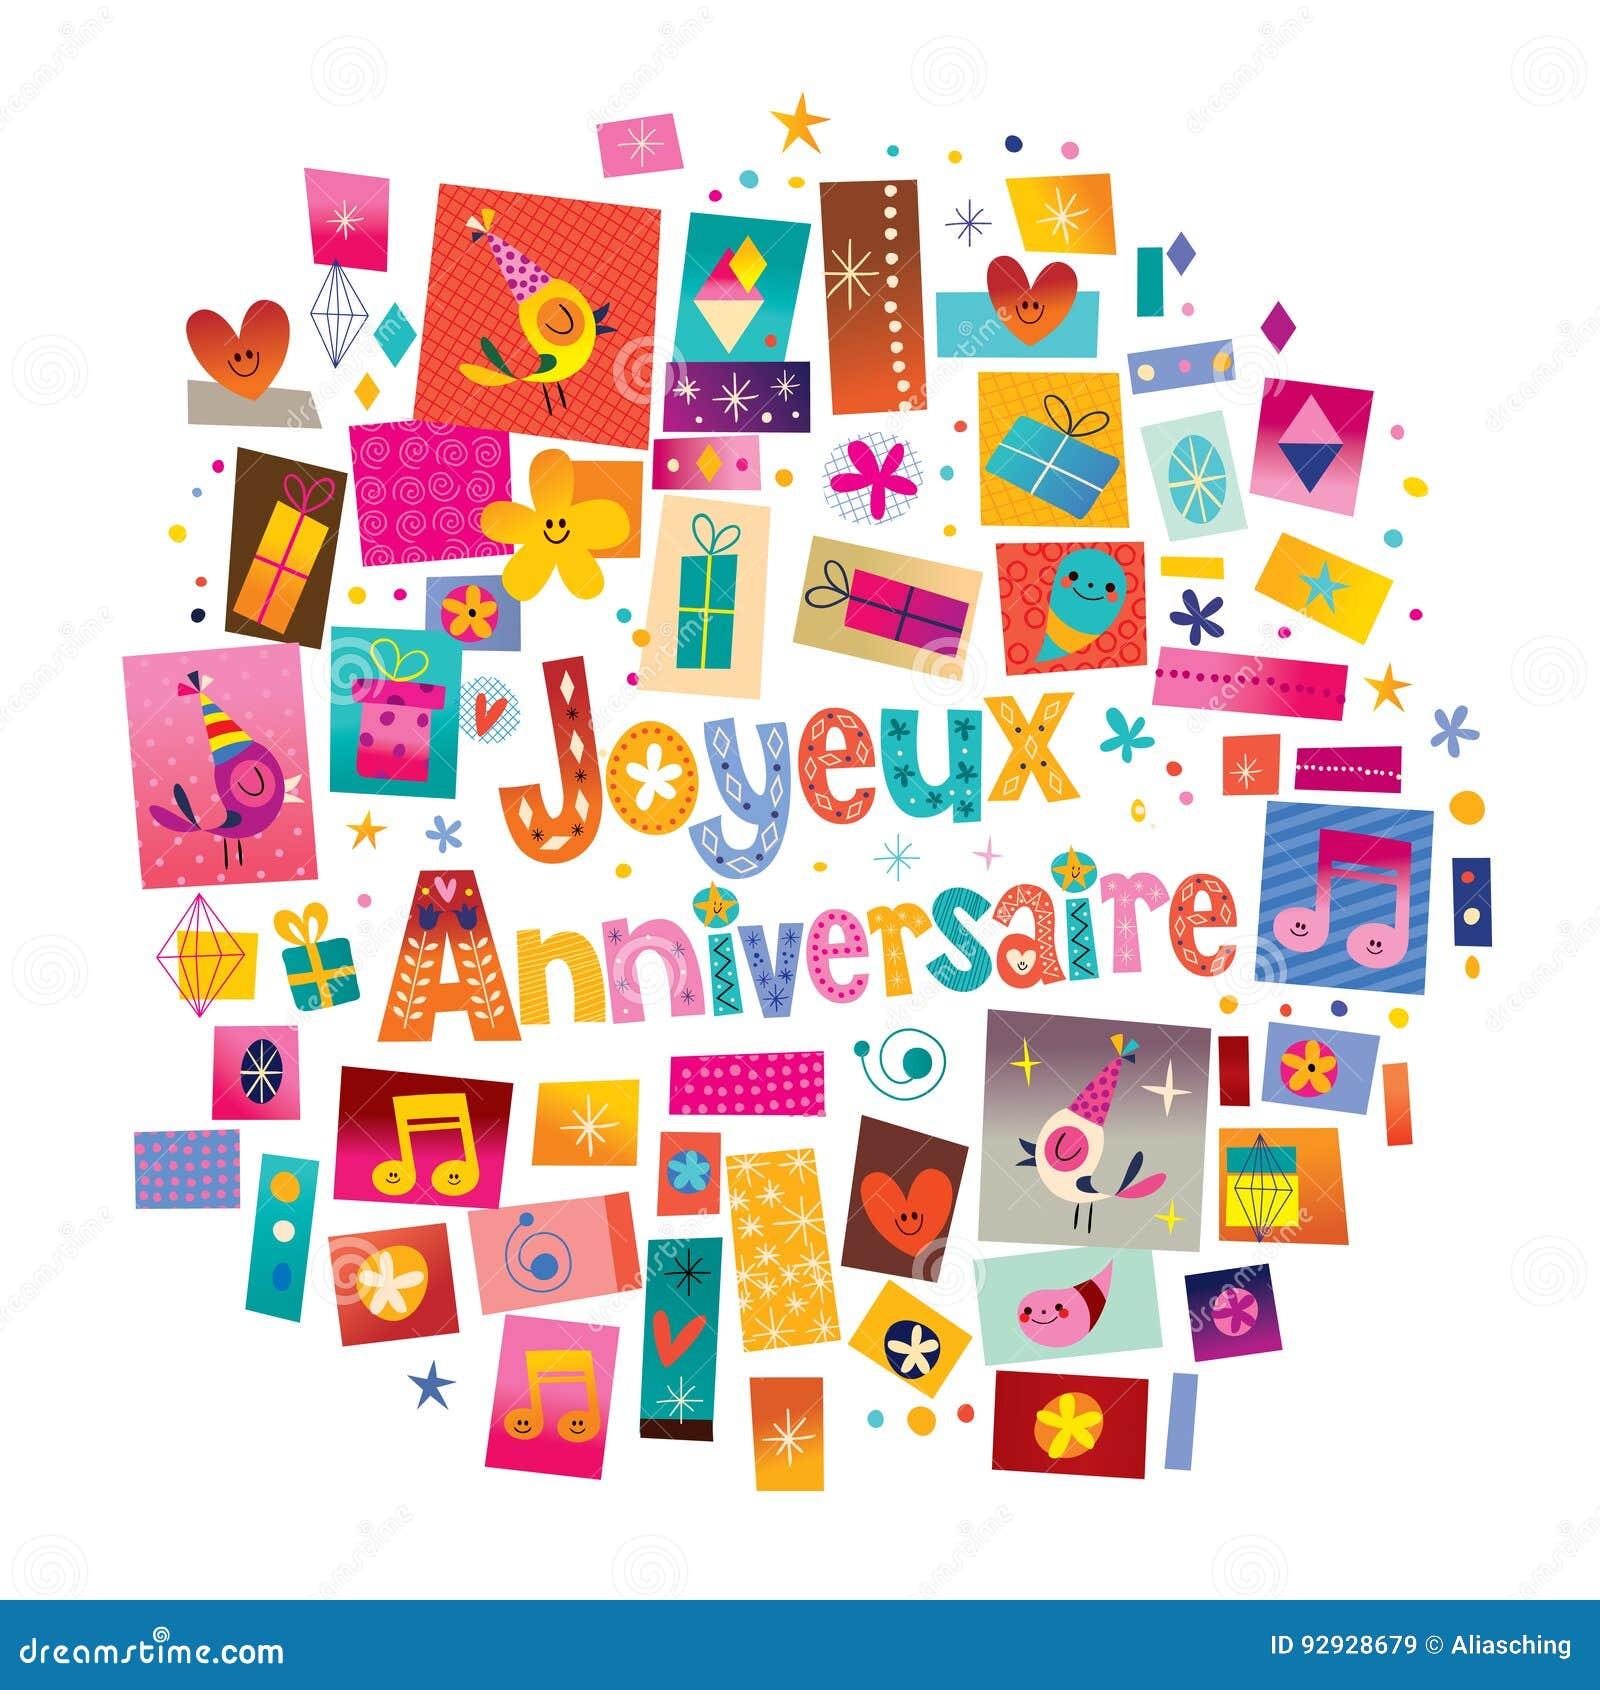 Joyeux Anniversaire lycklig födelsedag i franskt